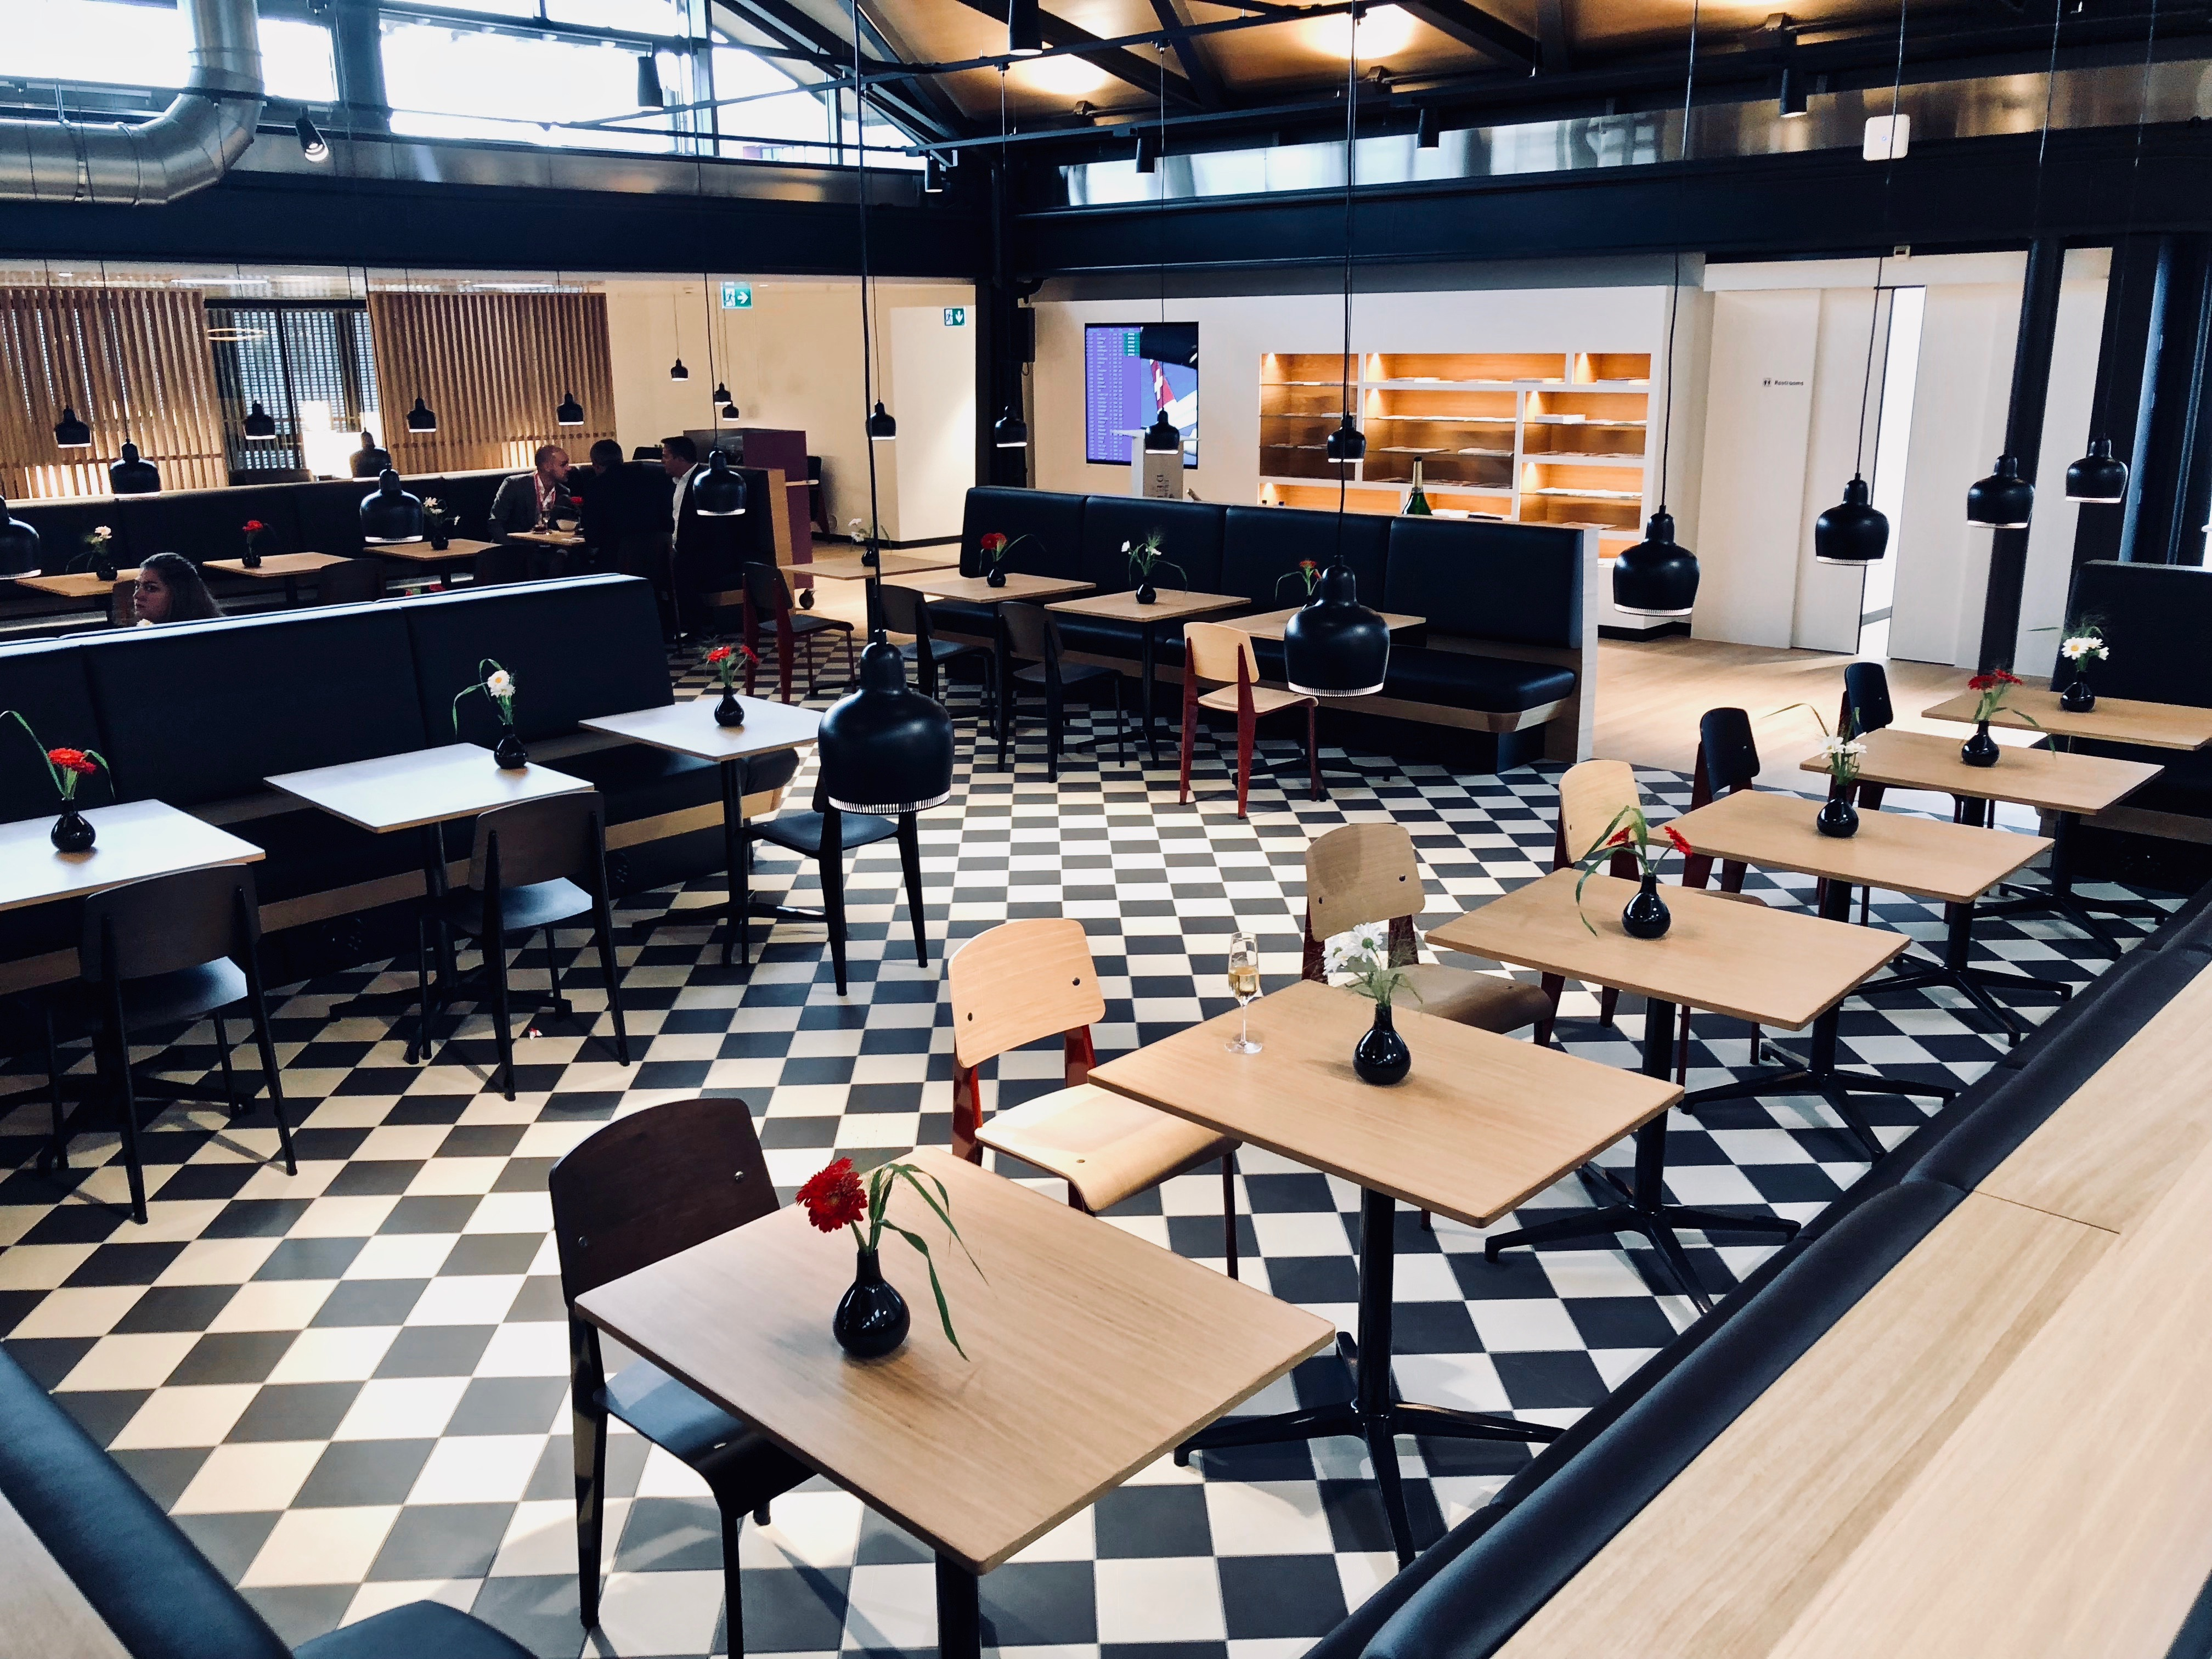 New SWISS lounges in Zurich